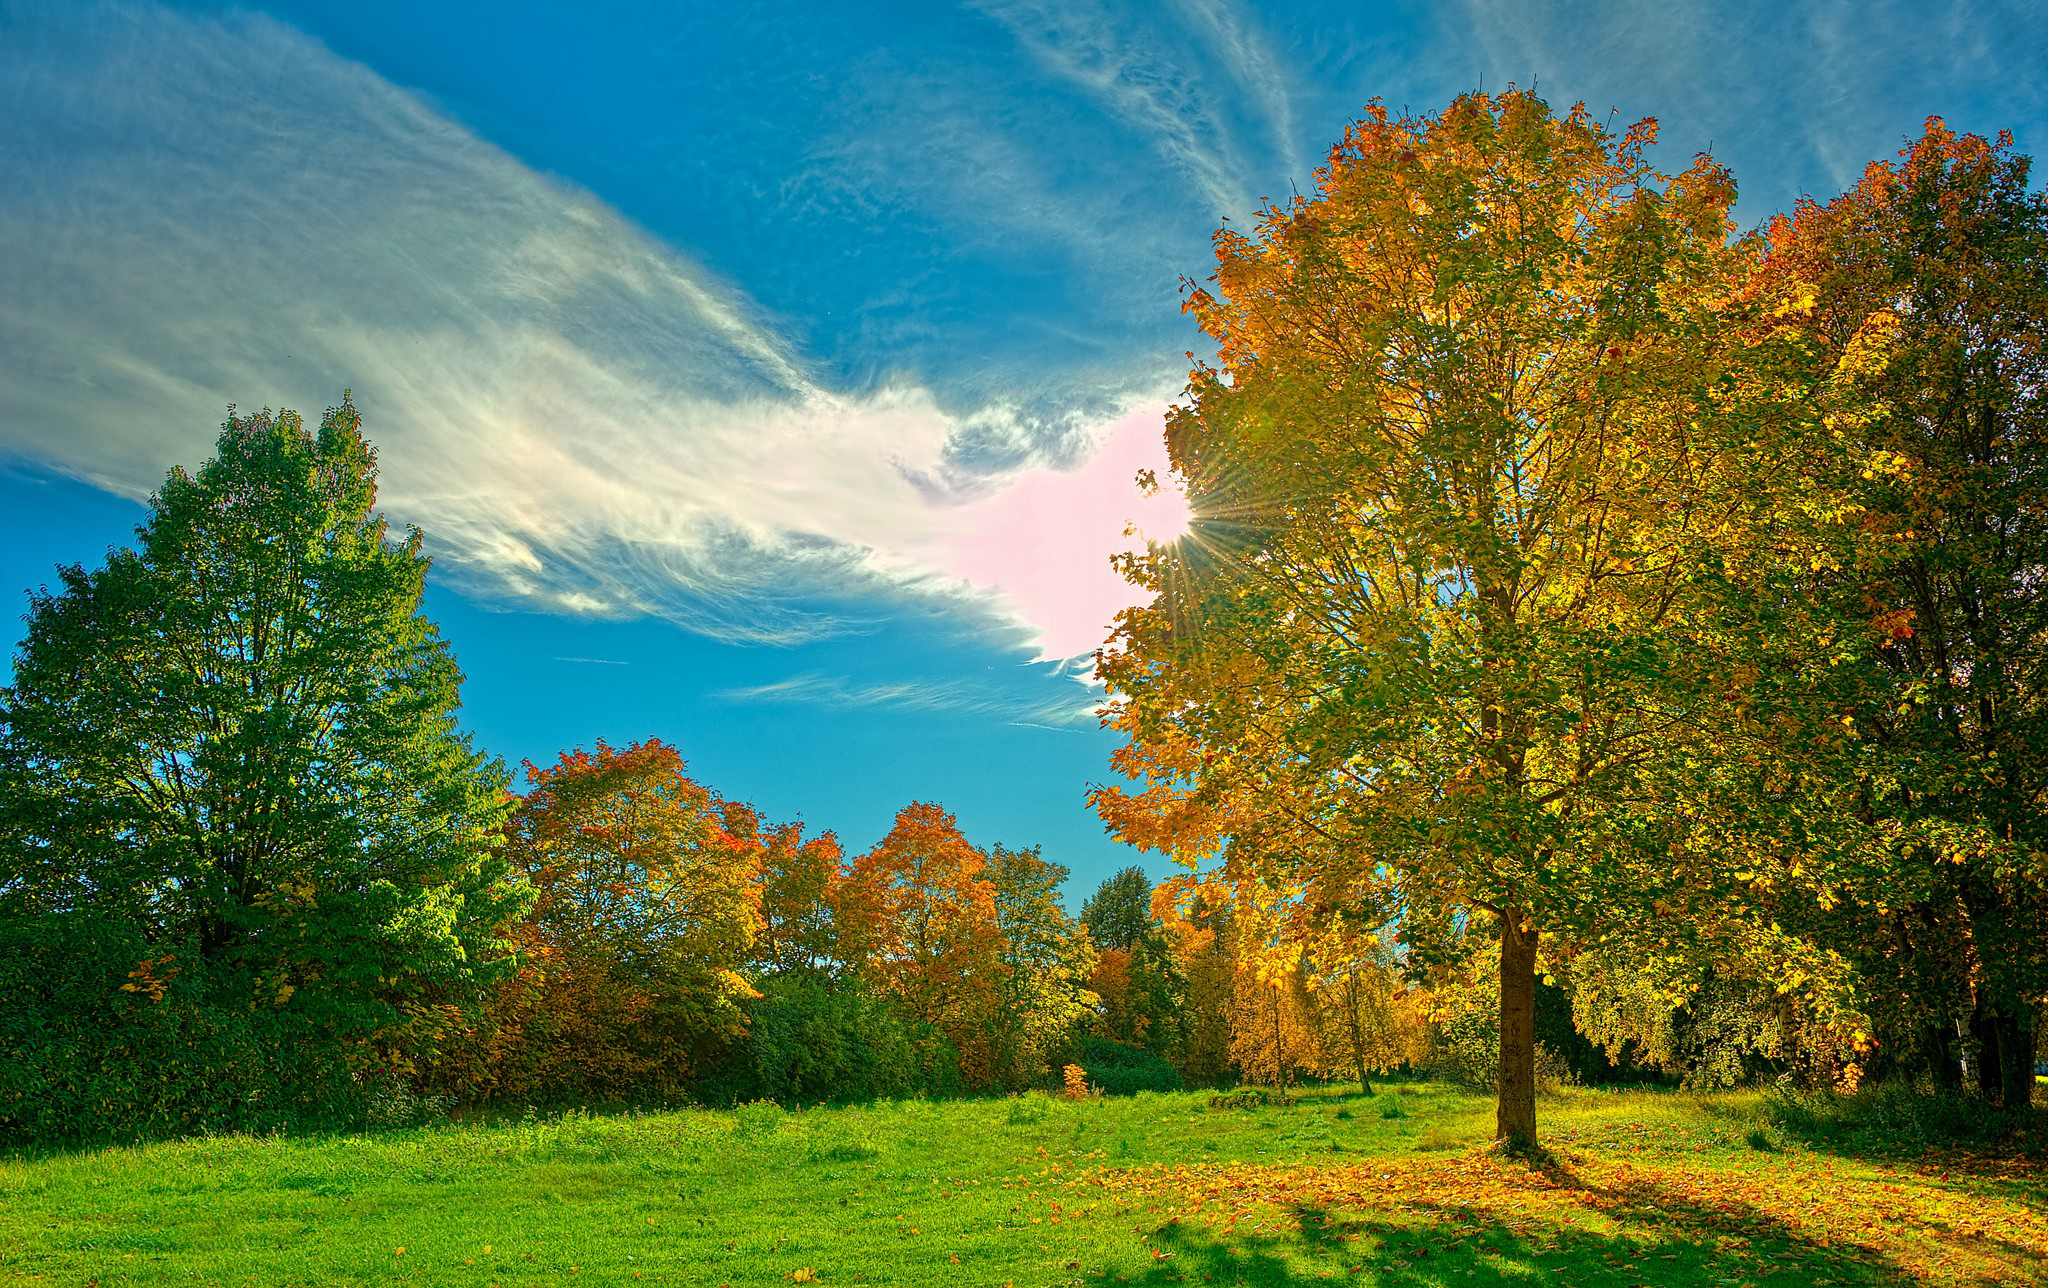 природа облака деревья трава солнце река небо без смс